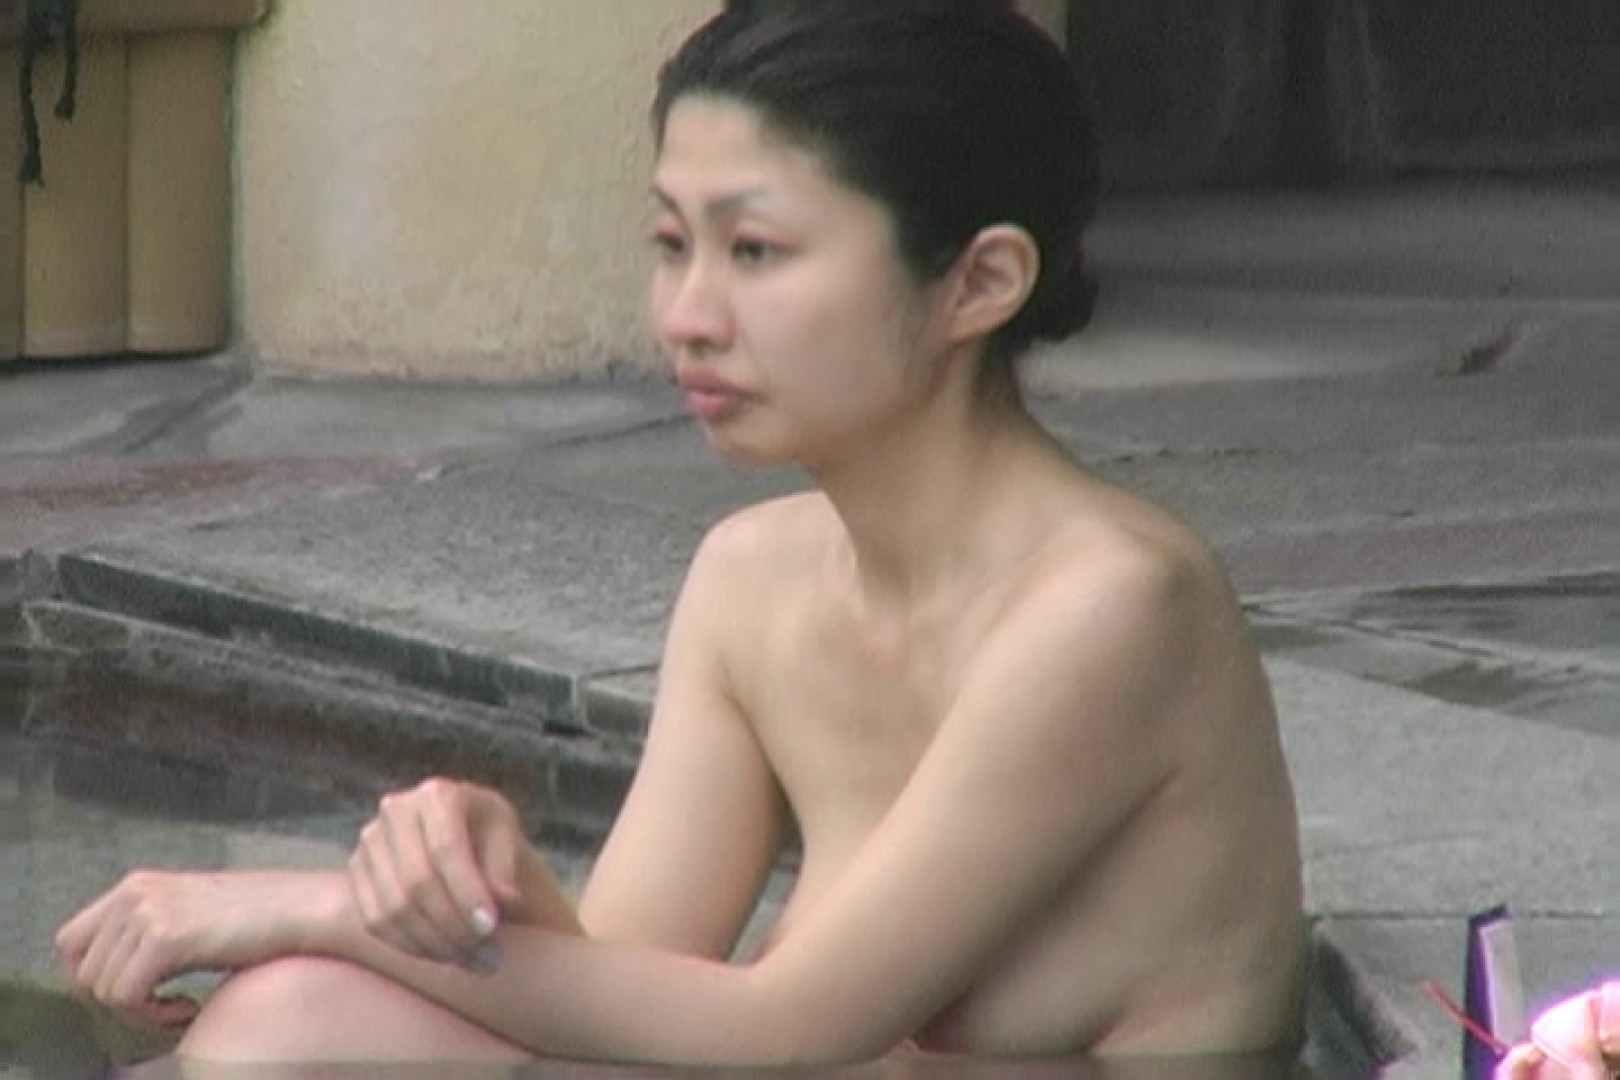 Aquaな露天風呂Vol.642 美しいOLの裸体 | 露天風呂突入  86pic 40